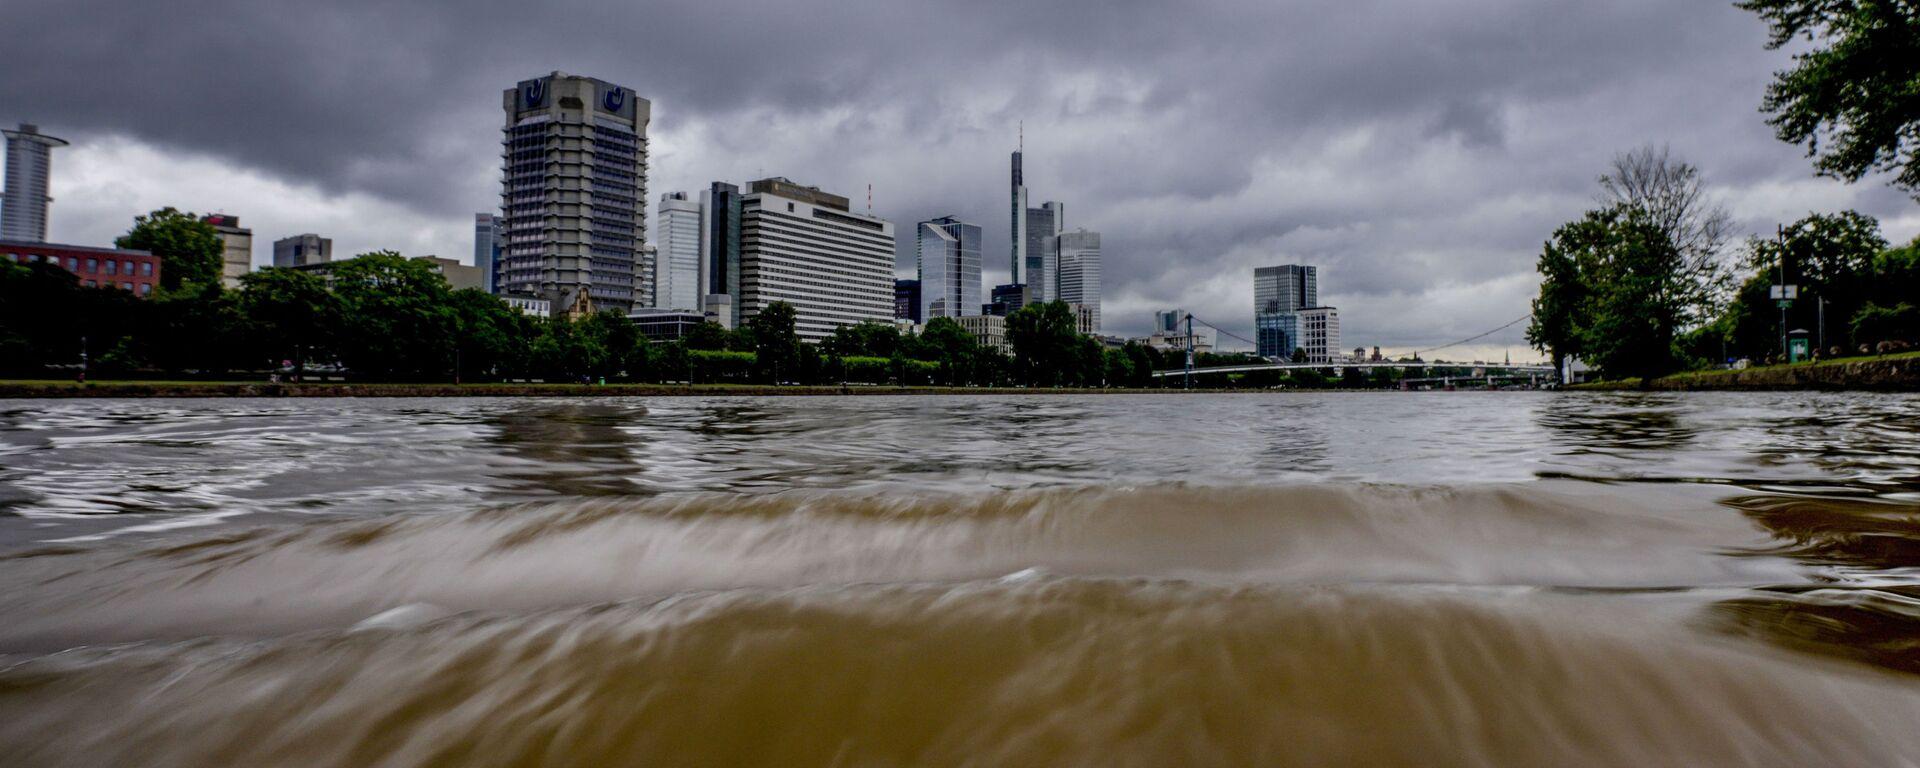 Разлившаяся река Майн во Франкфурте, Германия - Sputnik Латвия, 1920, 16.07.2021